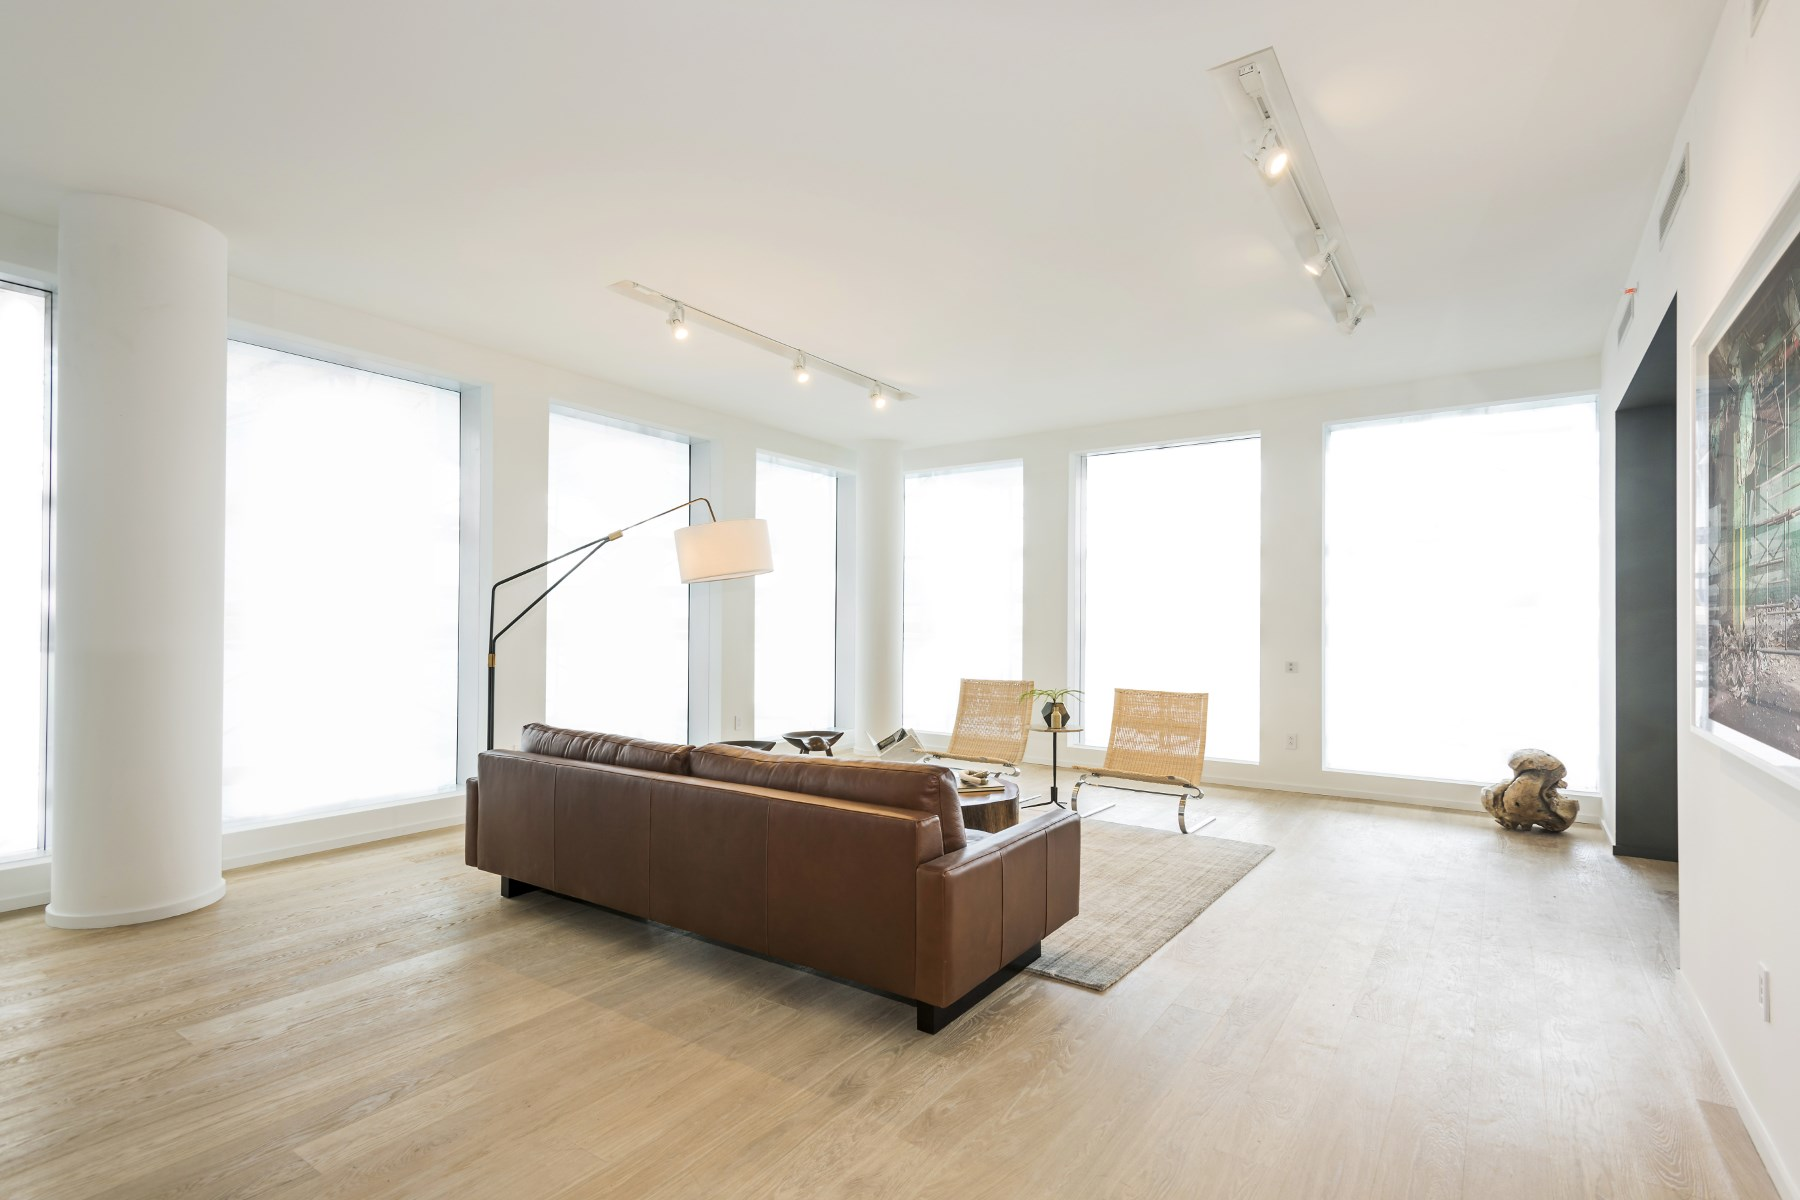 Condominium for Sale at 1 John Street, Unit 7B 1 John Street Apt 7b Dumbo, Brooklyn, New York, 11201 United States